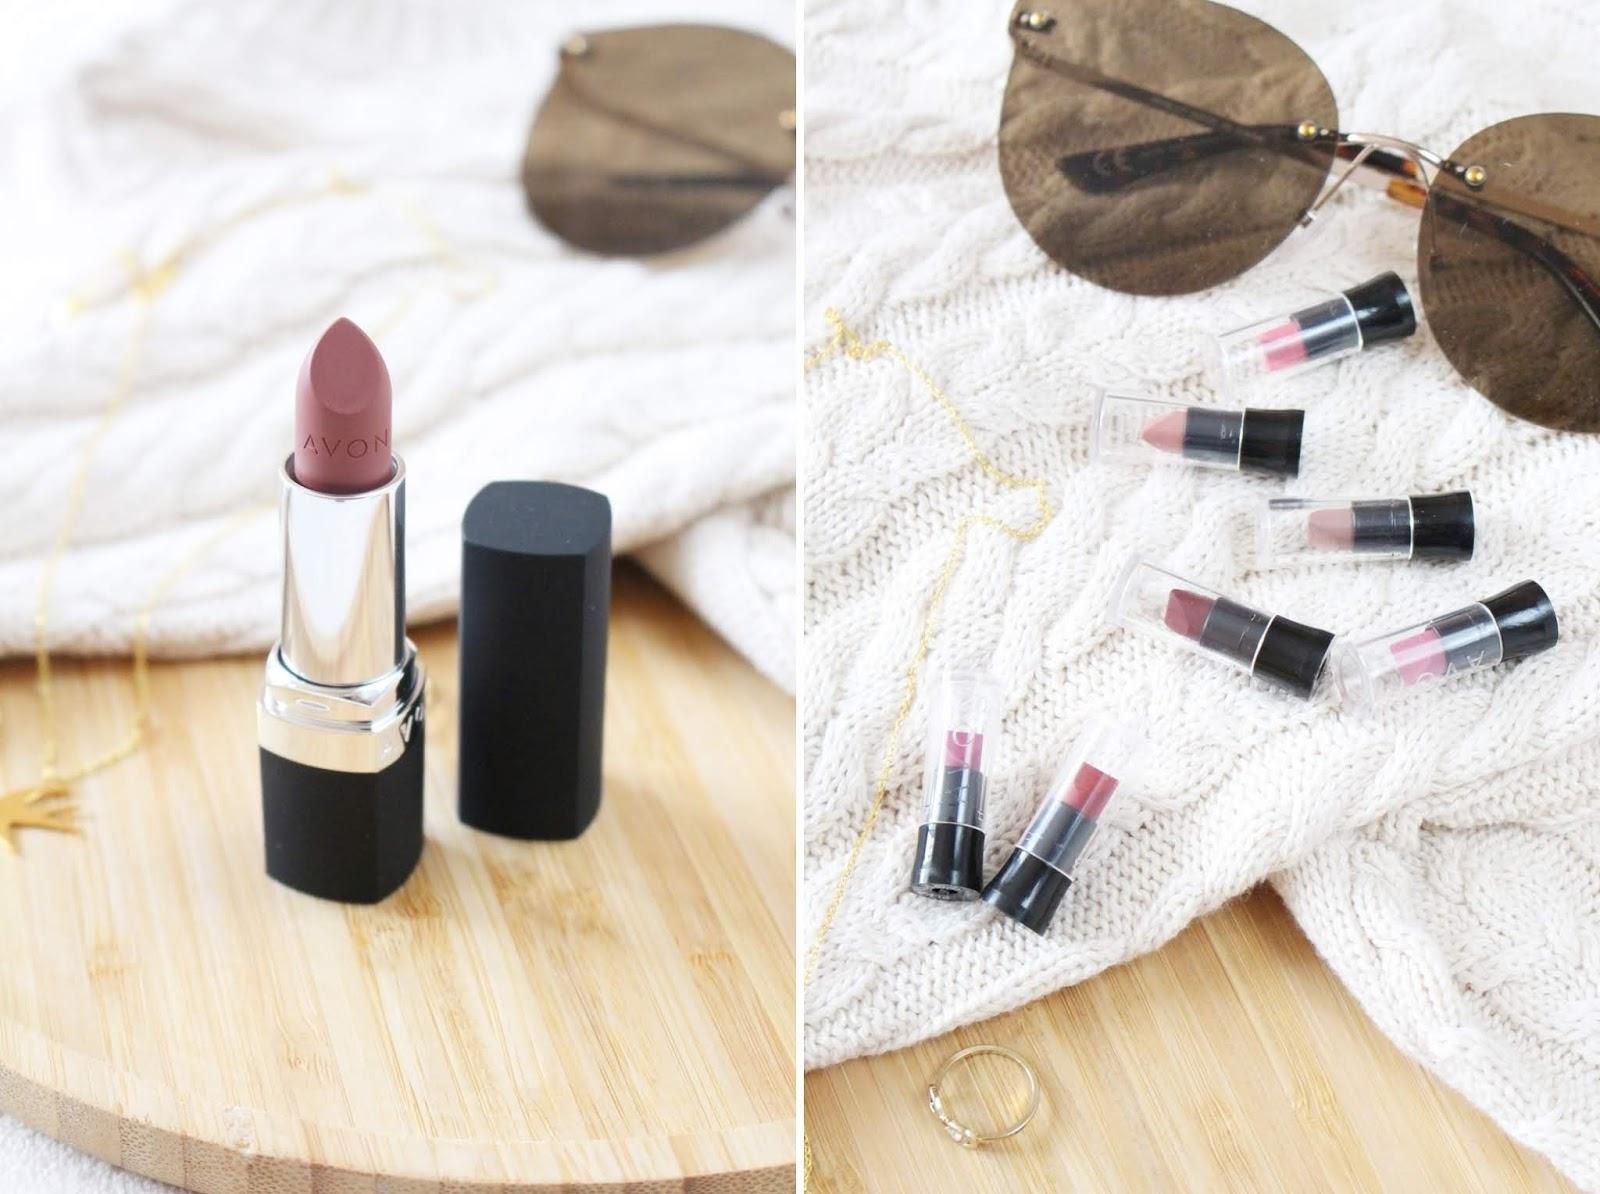 avon-szminki-delicate-matte